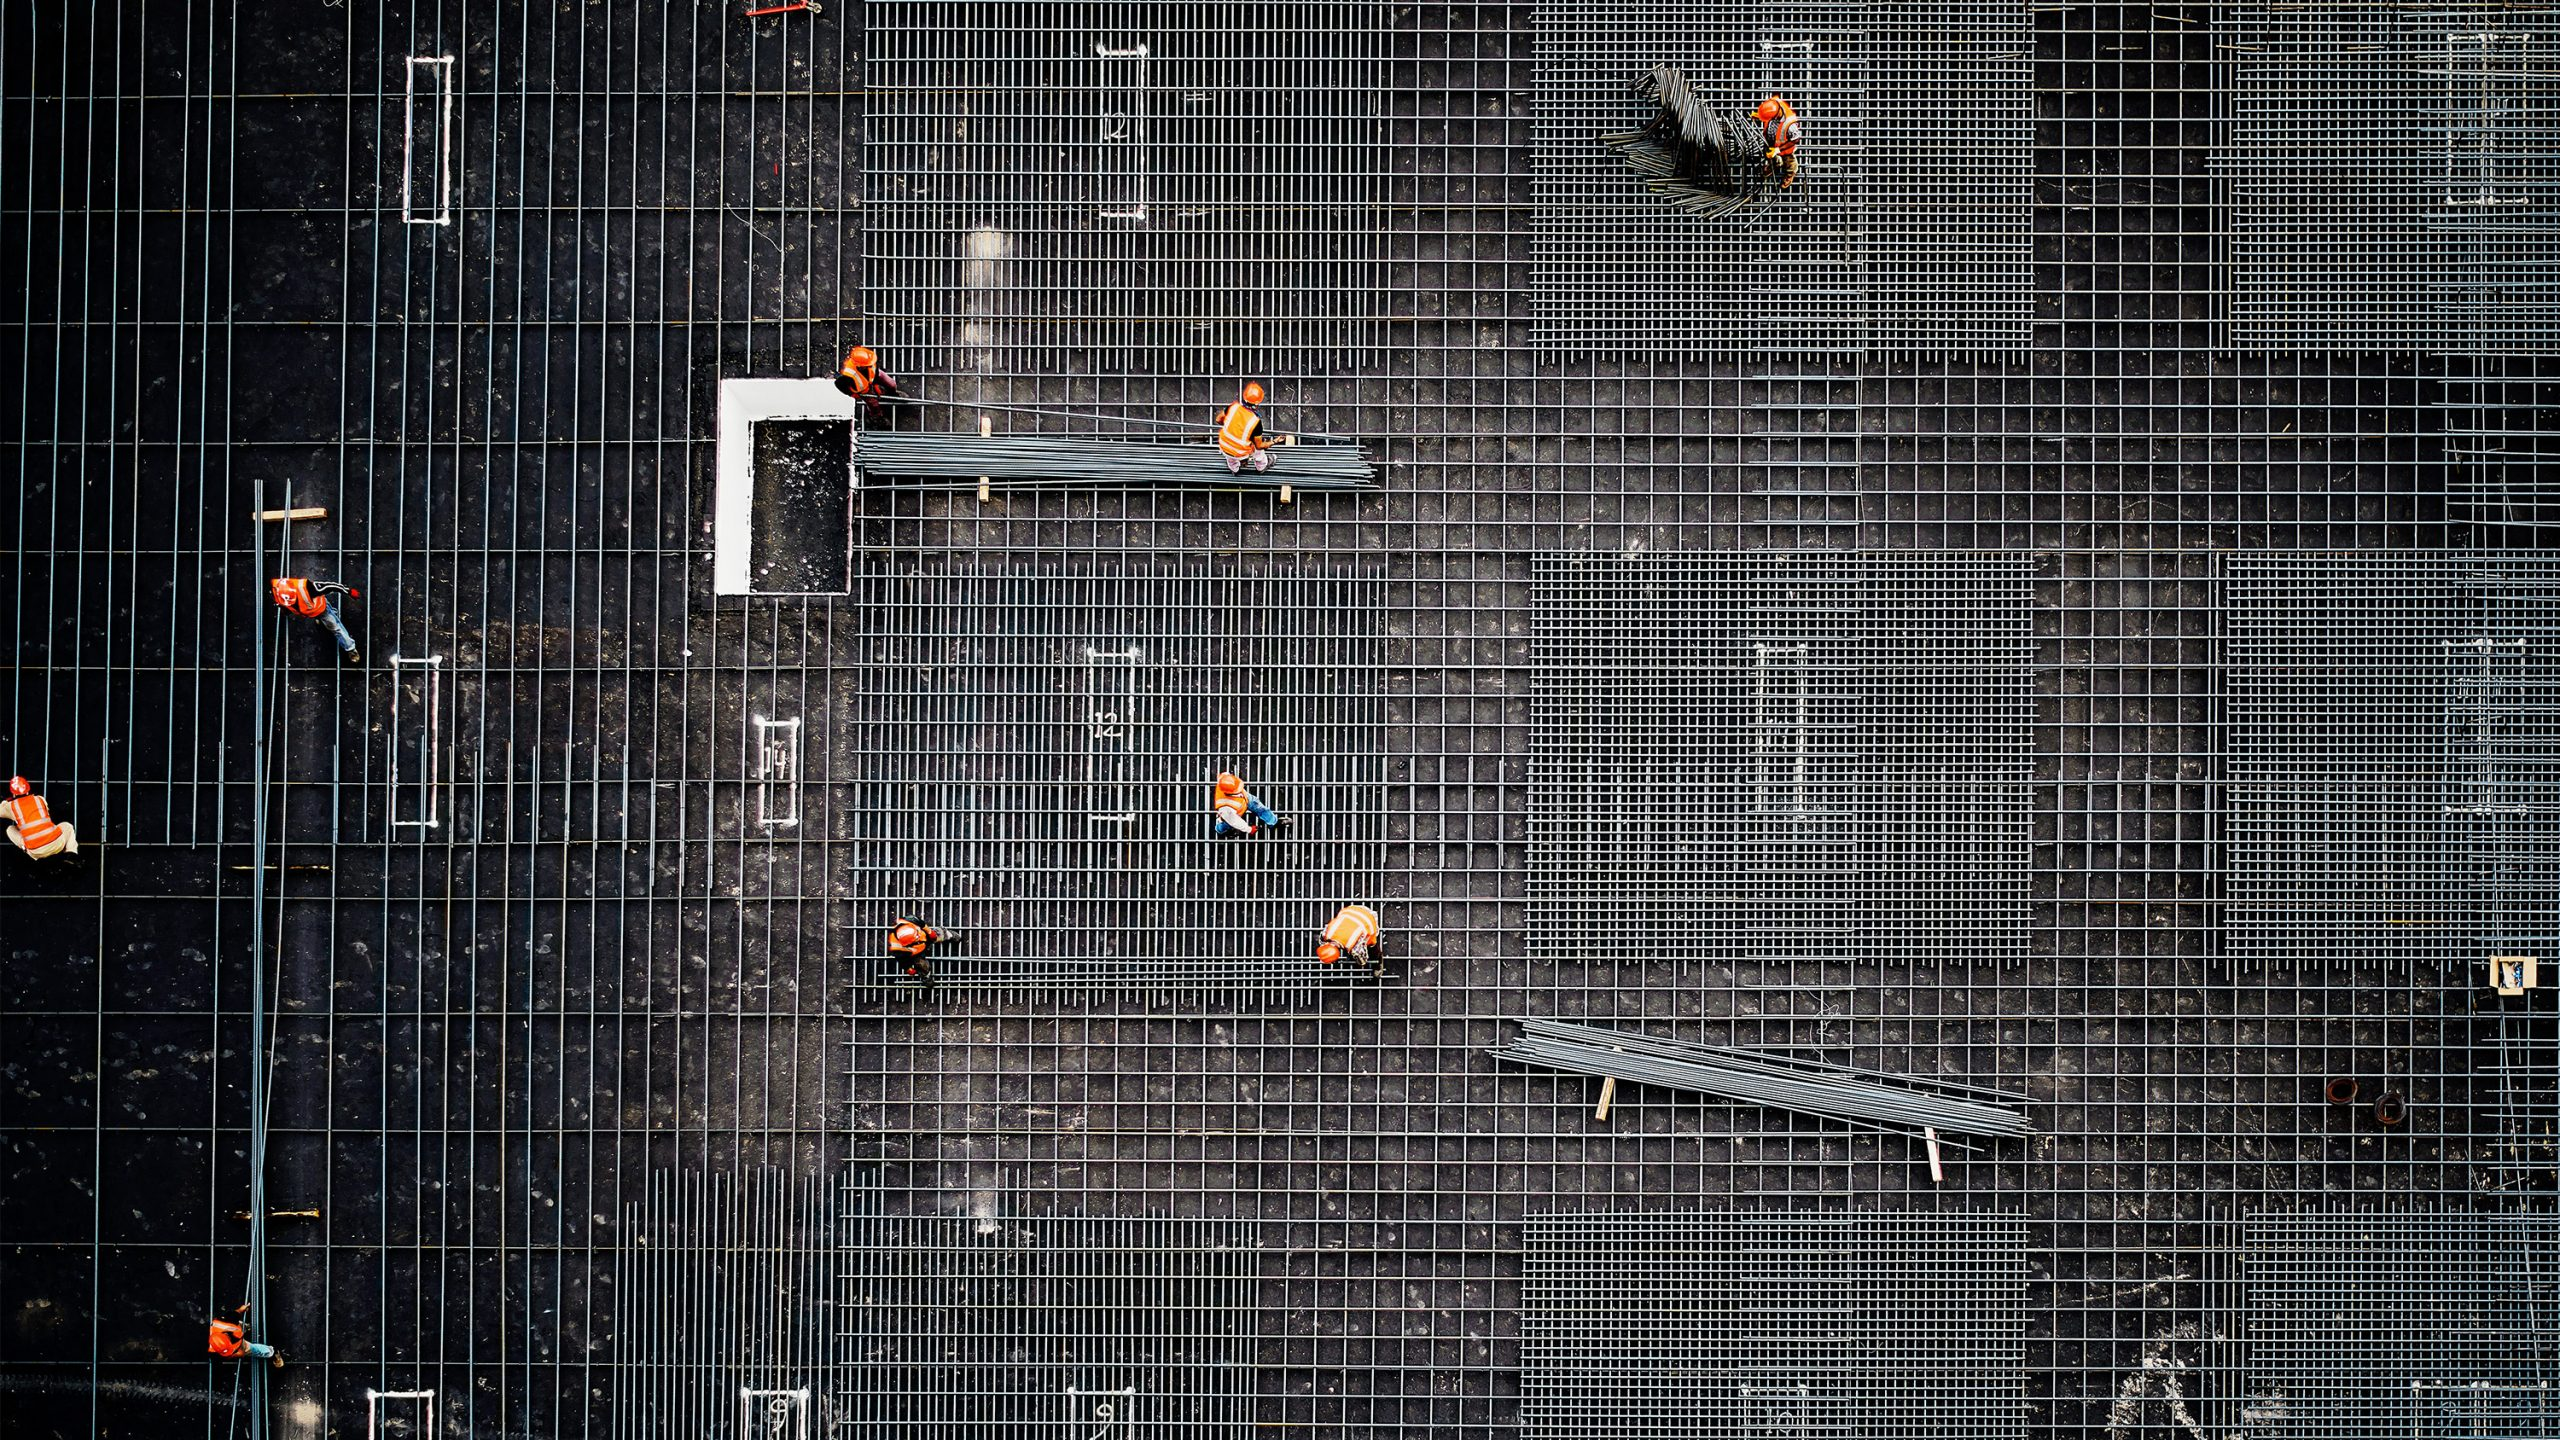 MIT Tech Review: 工事の遅れをGoPro画像から分析、建設現場向けAIが英国で活躍中